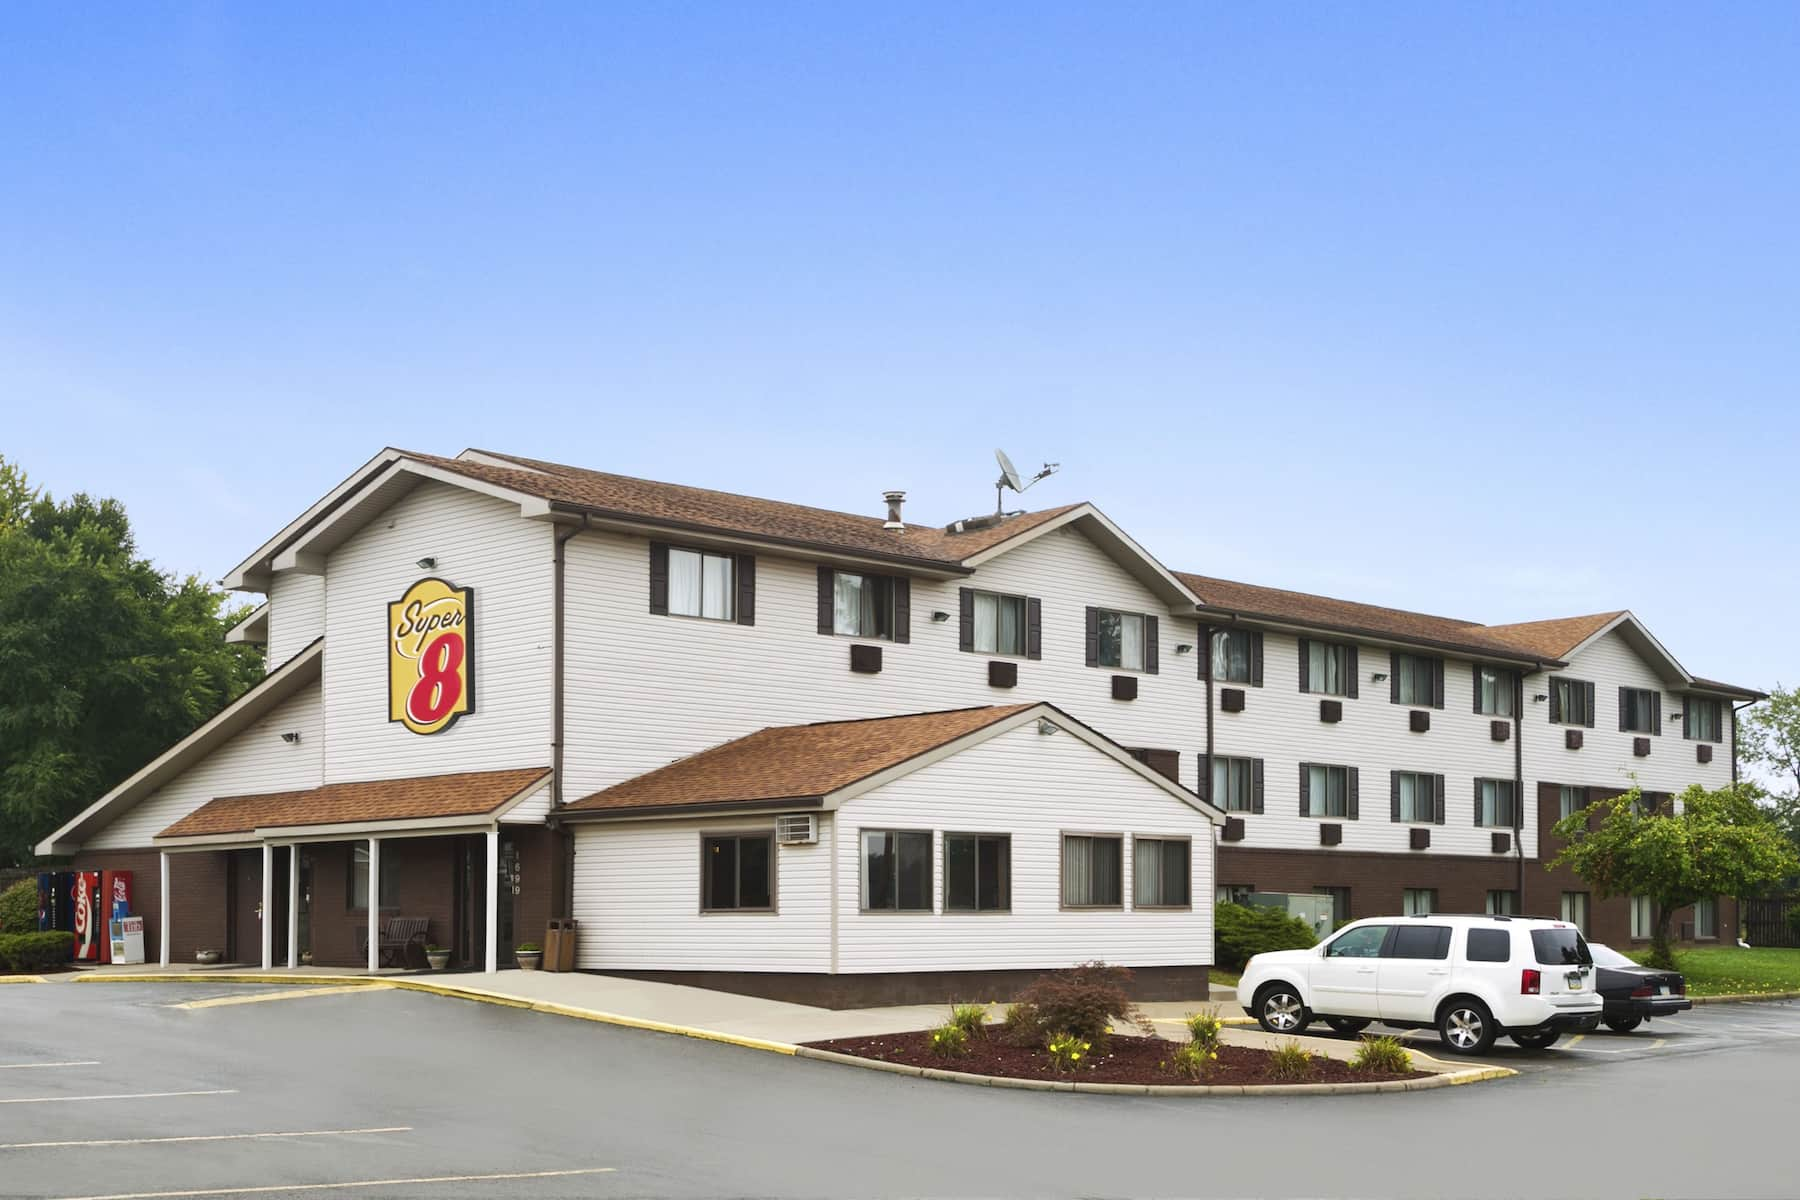 New castle pennsylvania casino